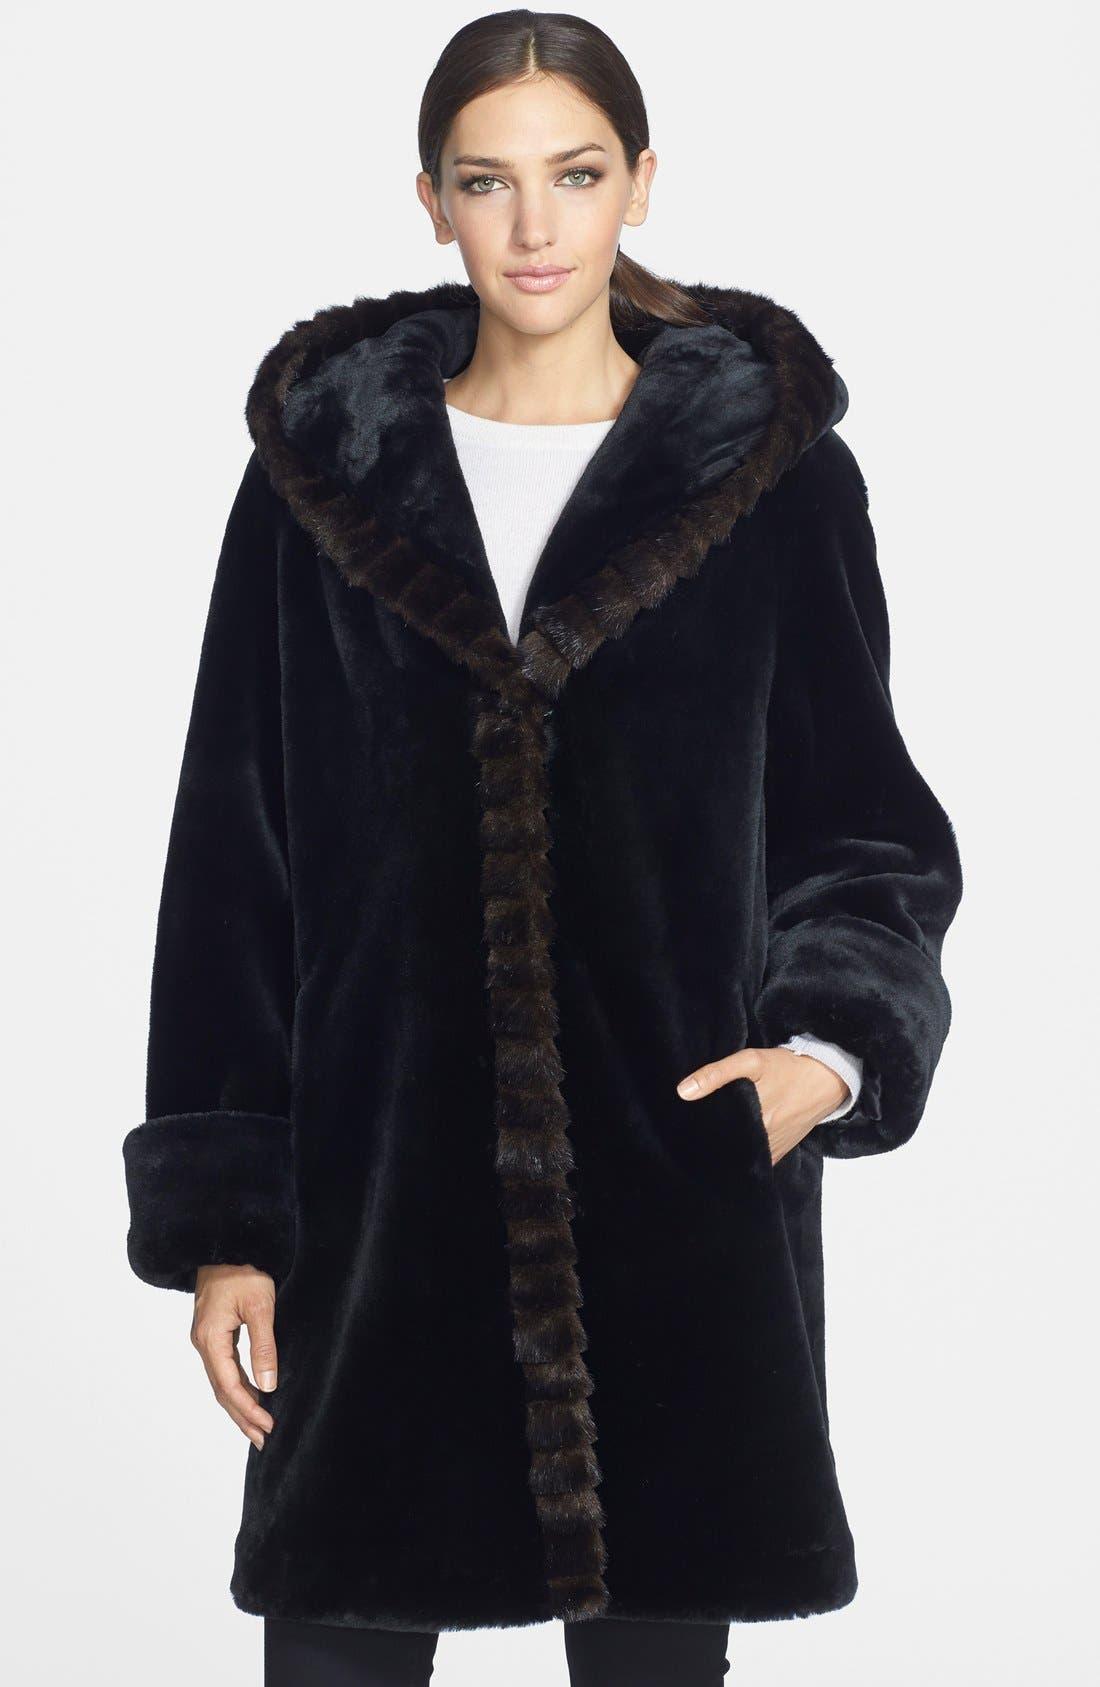 Alternate Image 1 Selected - Gallery Hooded Faux Fur Walking Coat (Online Only)